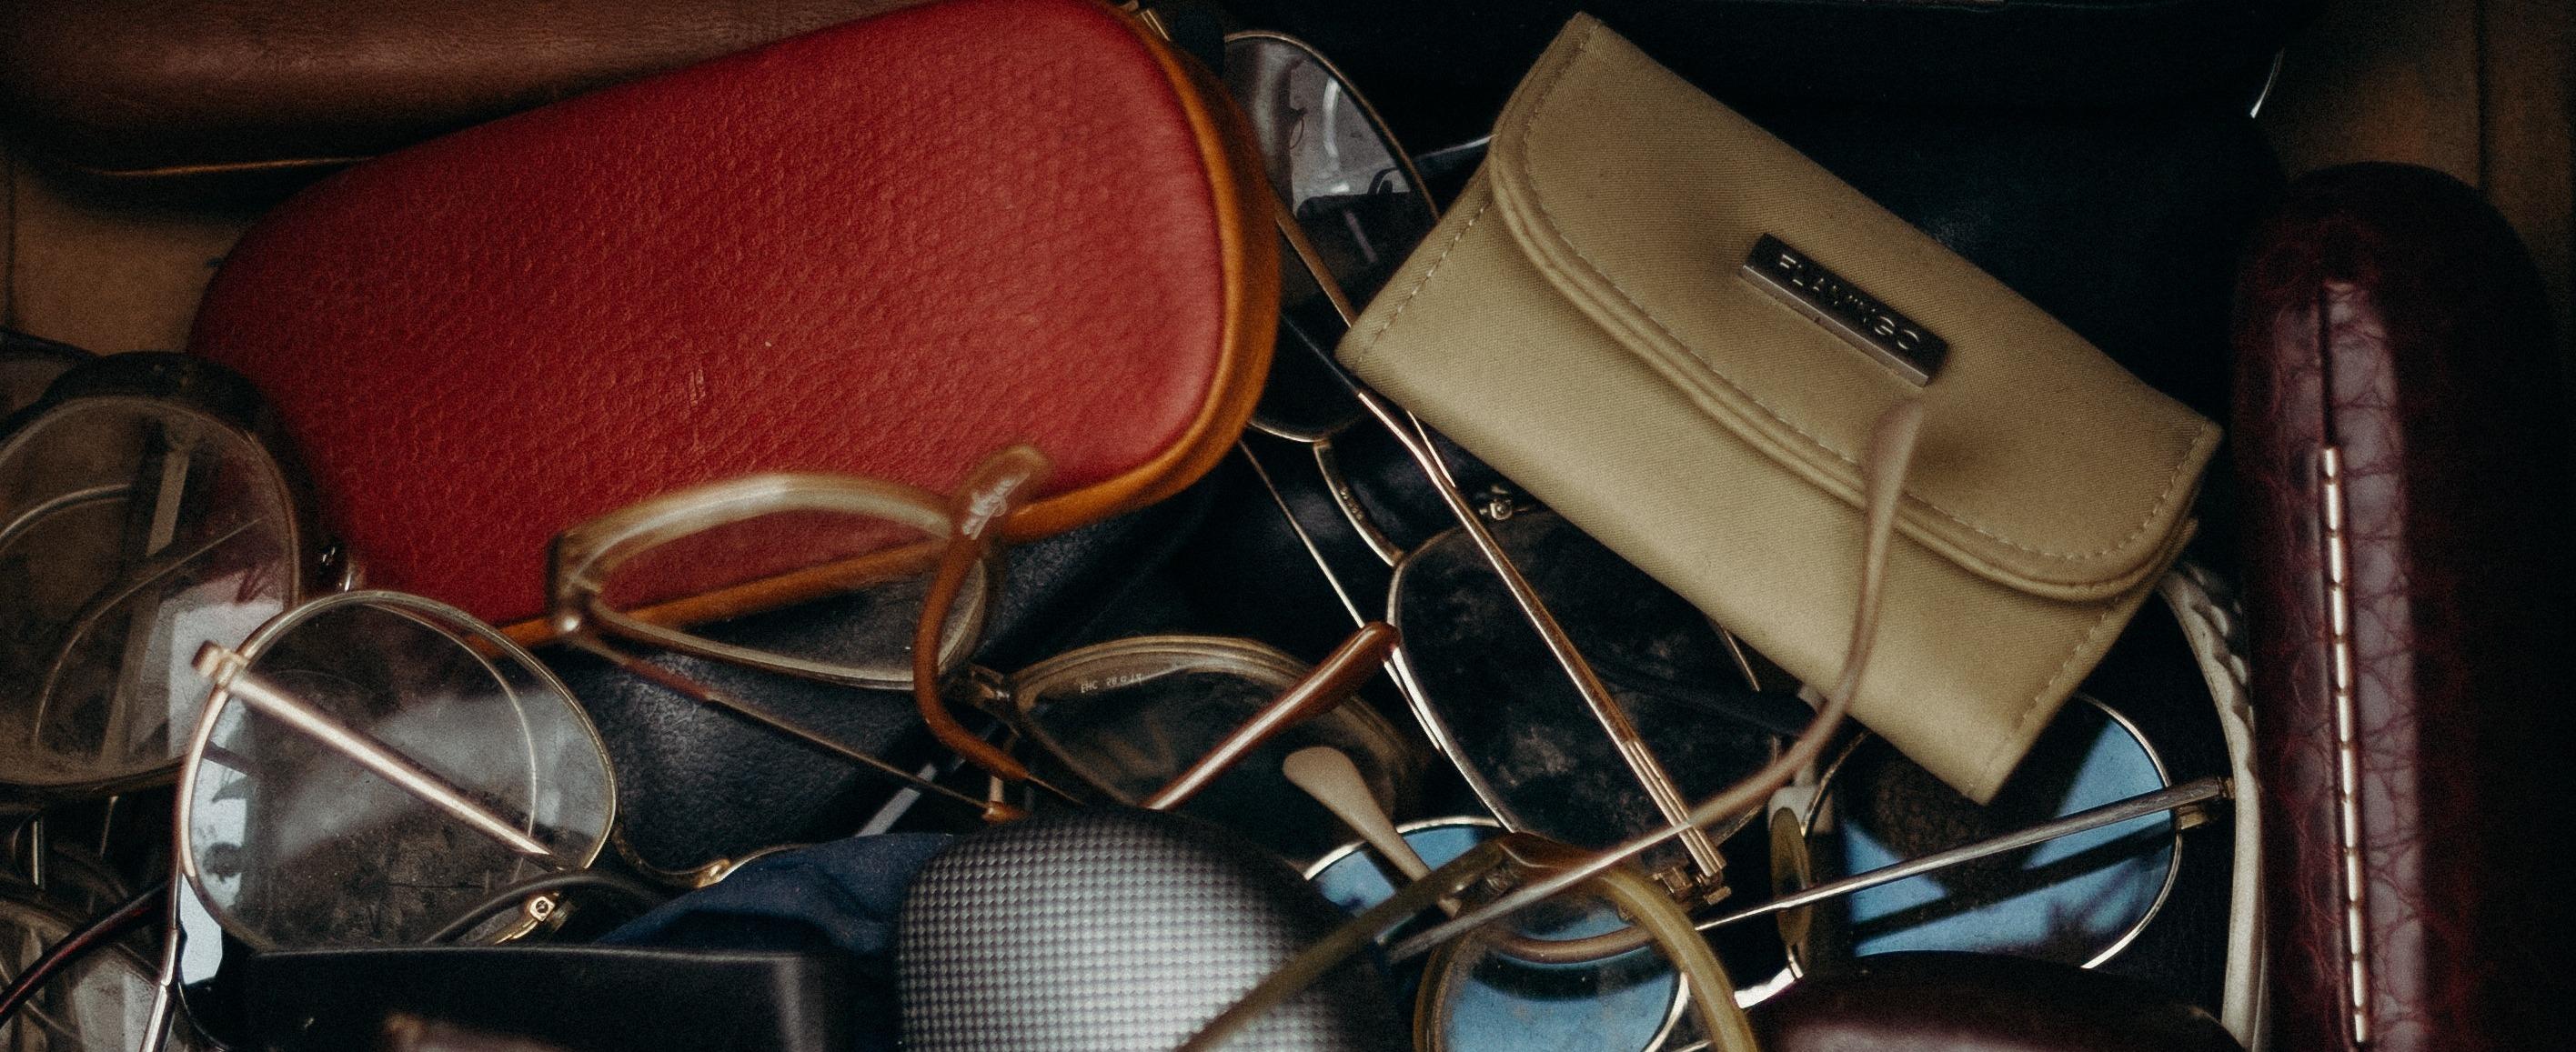 knockoff purses and sunglasses